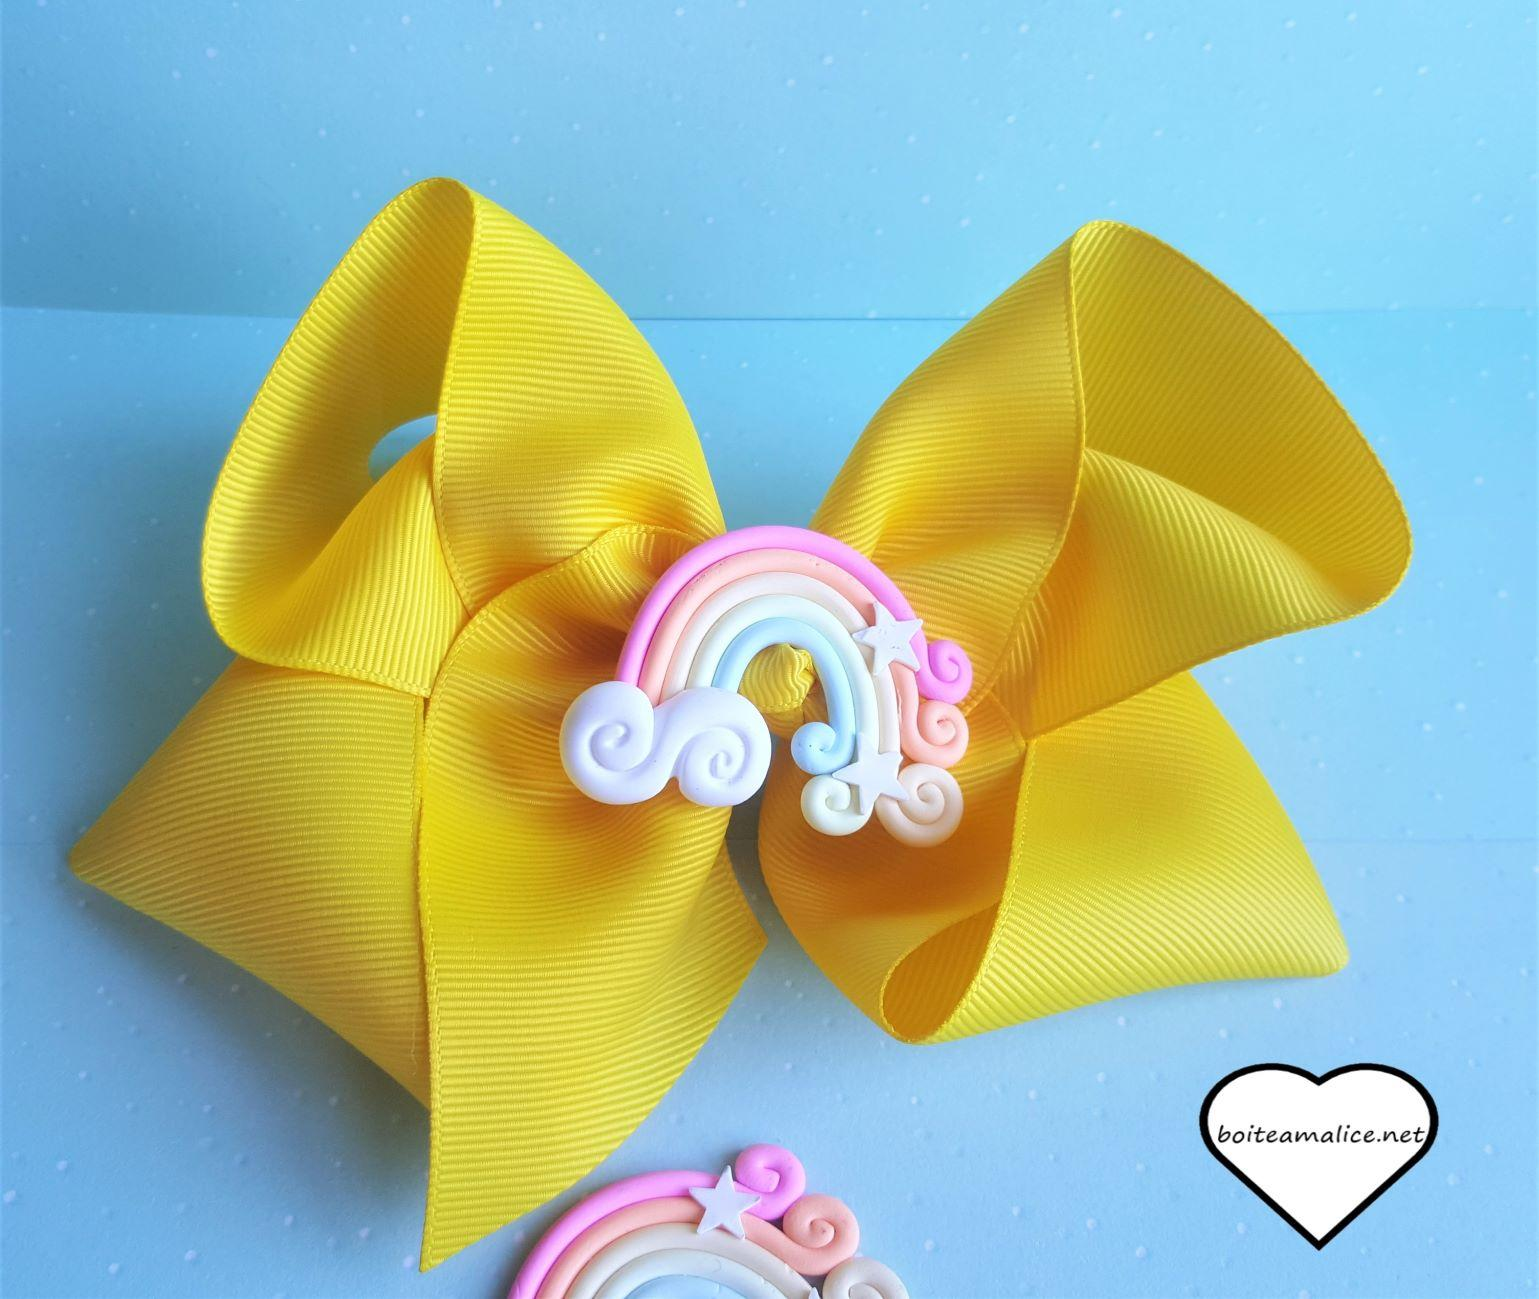 Gros noeud cute arc en ciel jaune